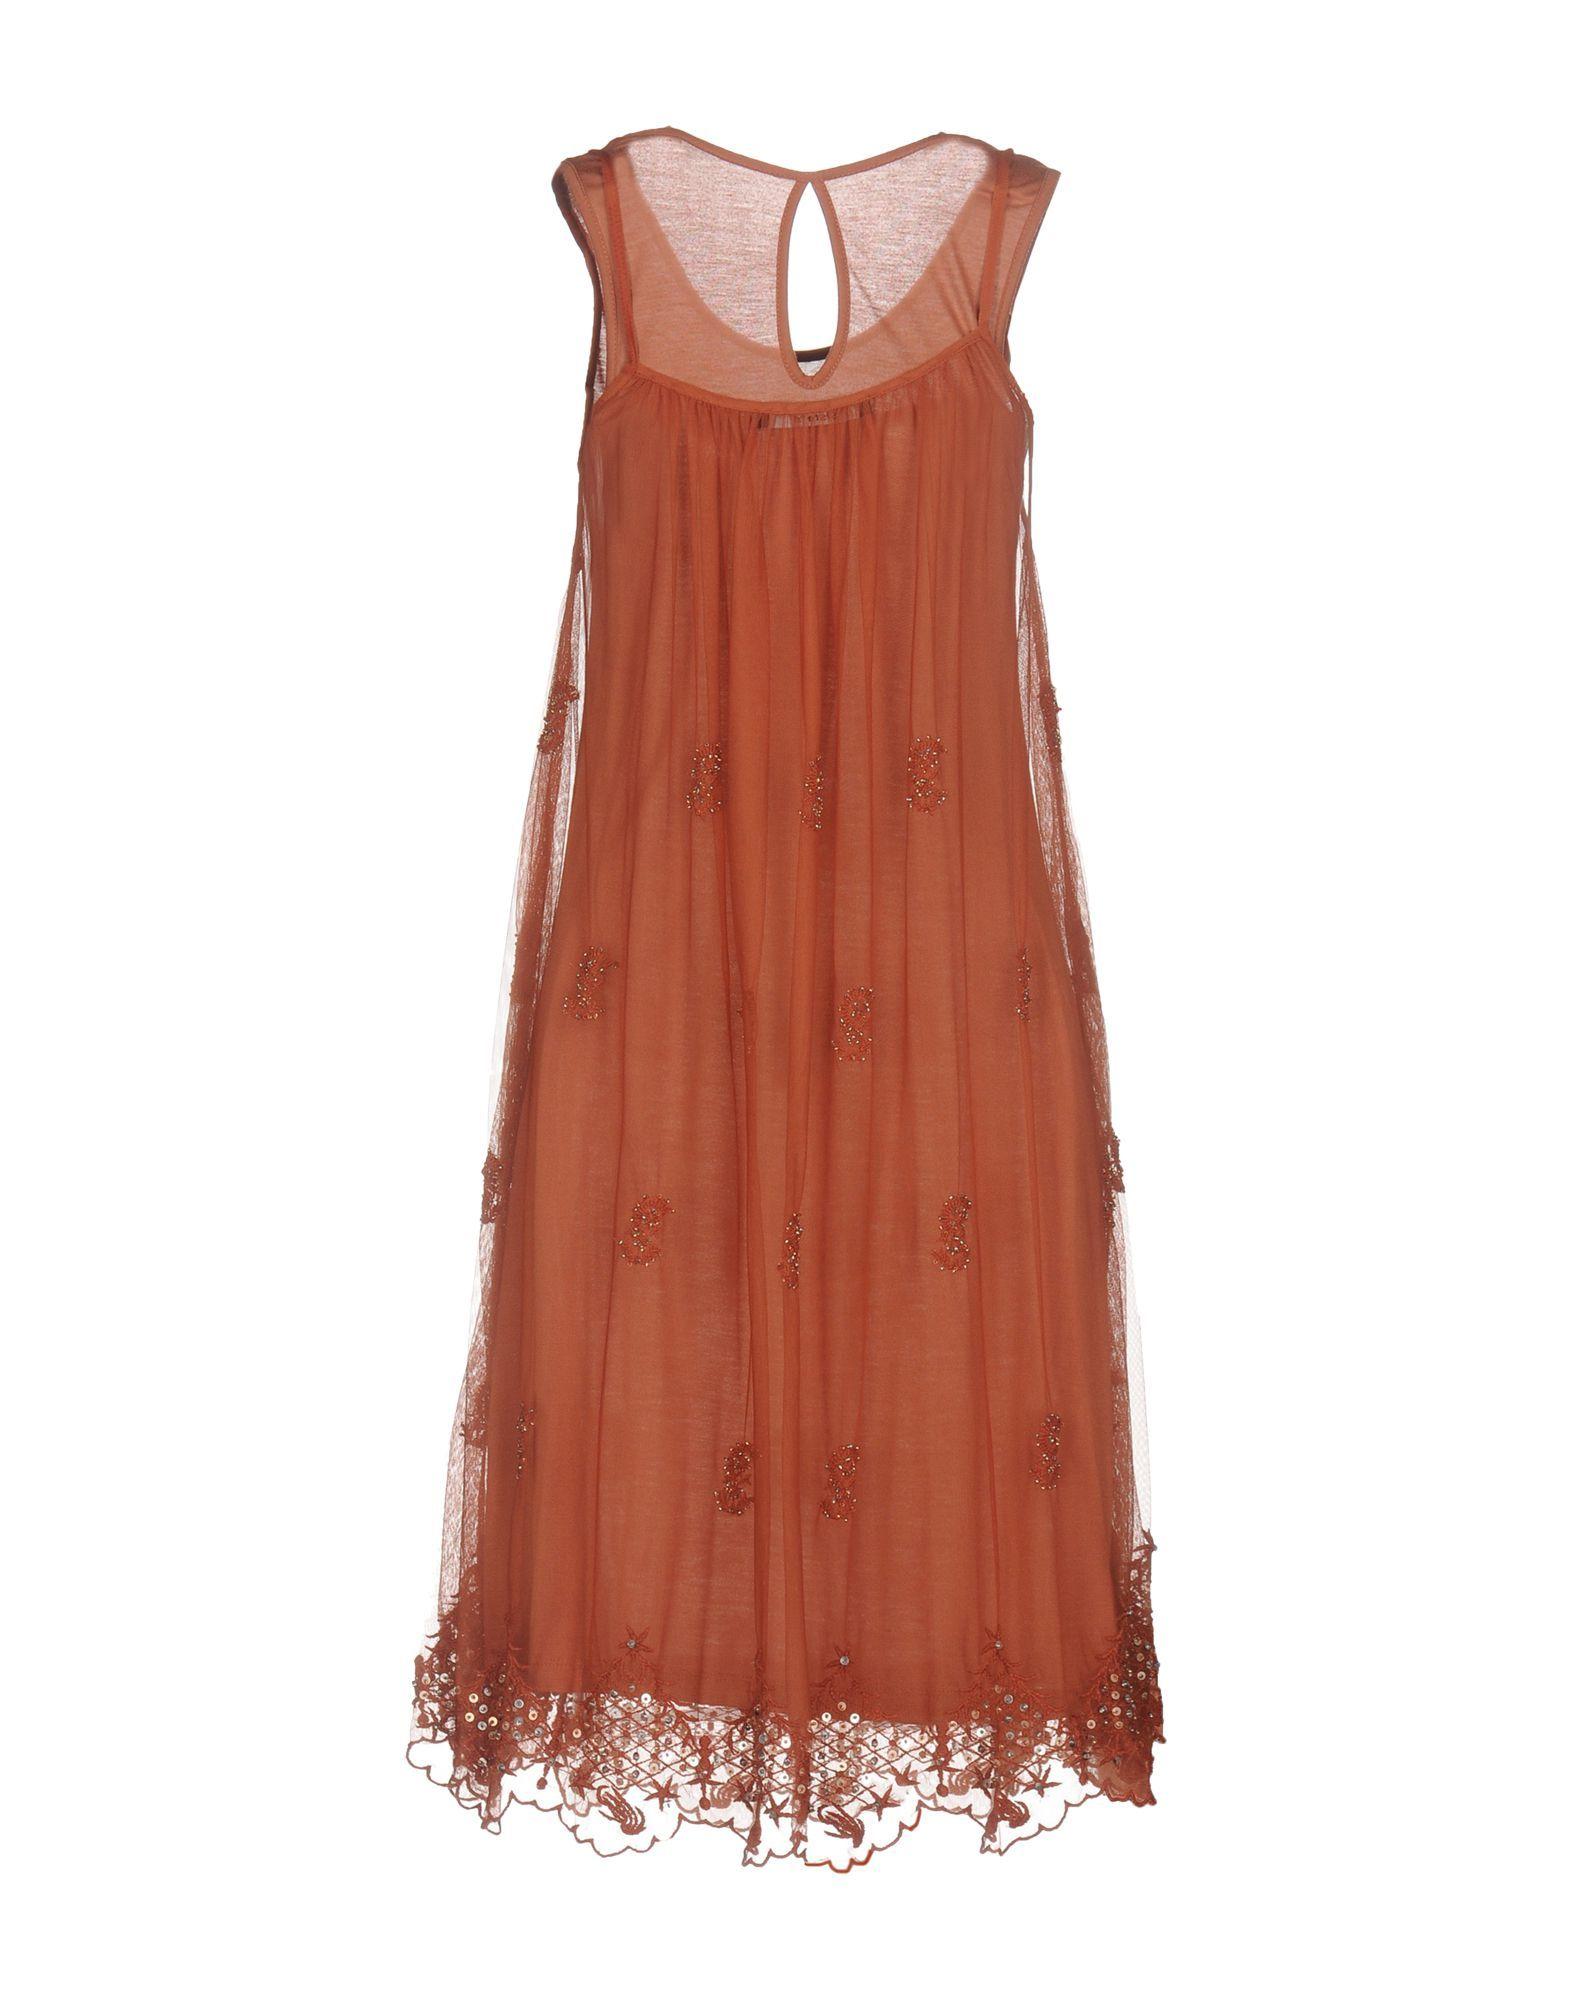 Siste' S Brick Red Tulle Overlay Dress